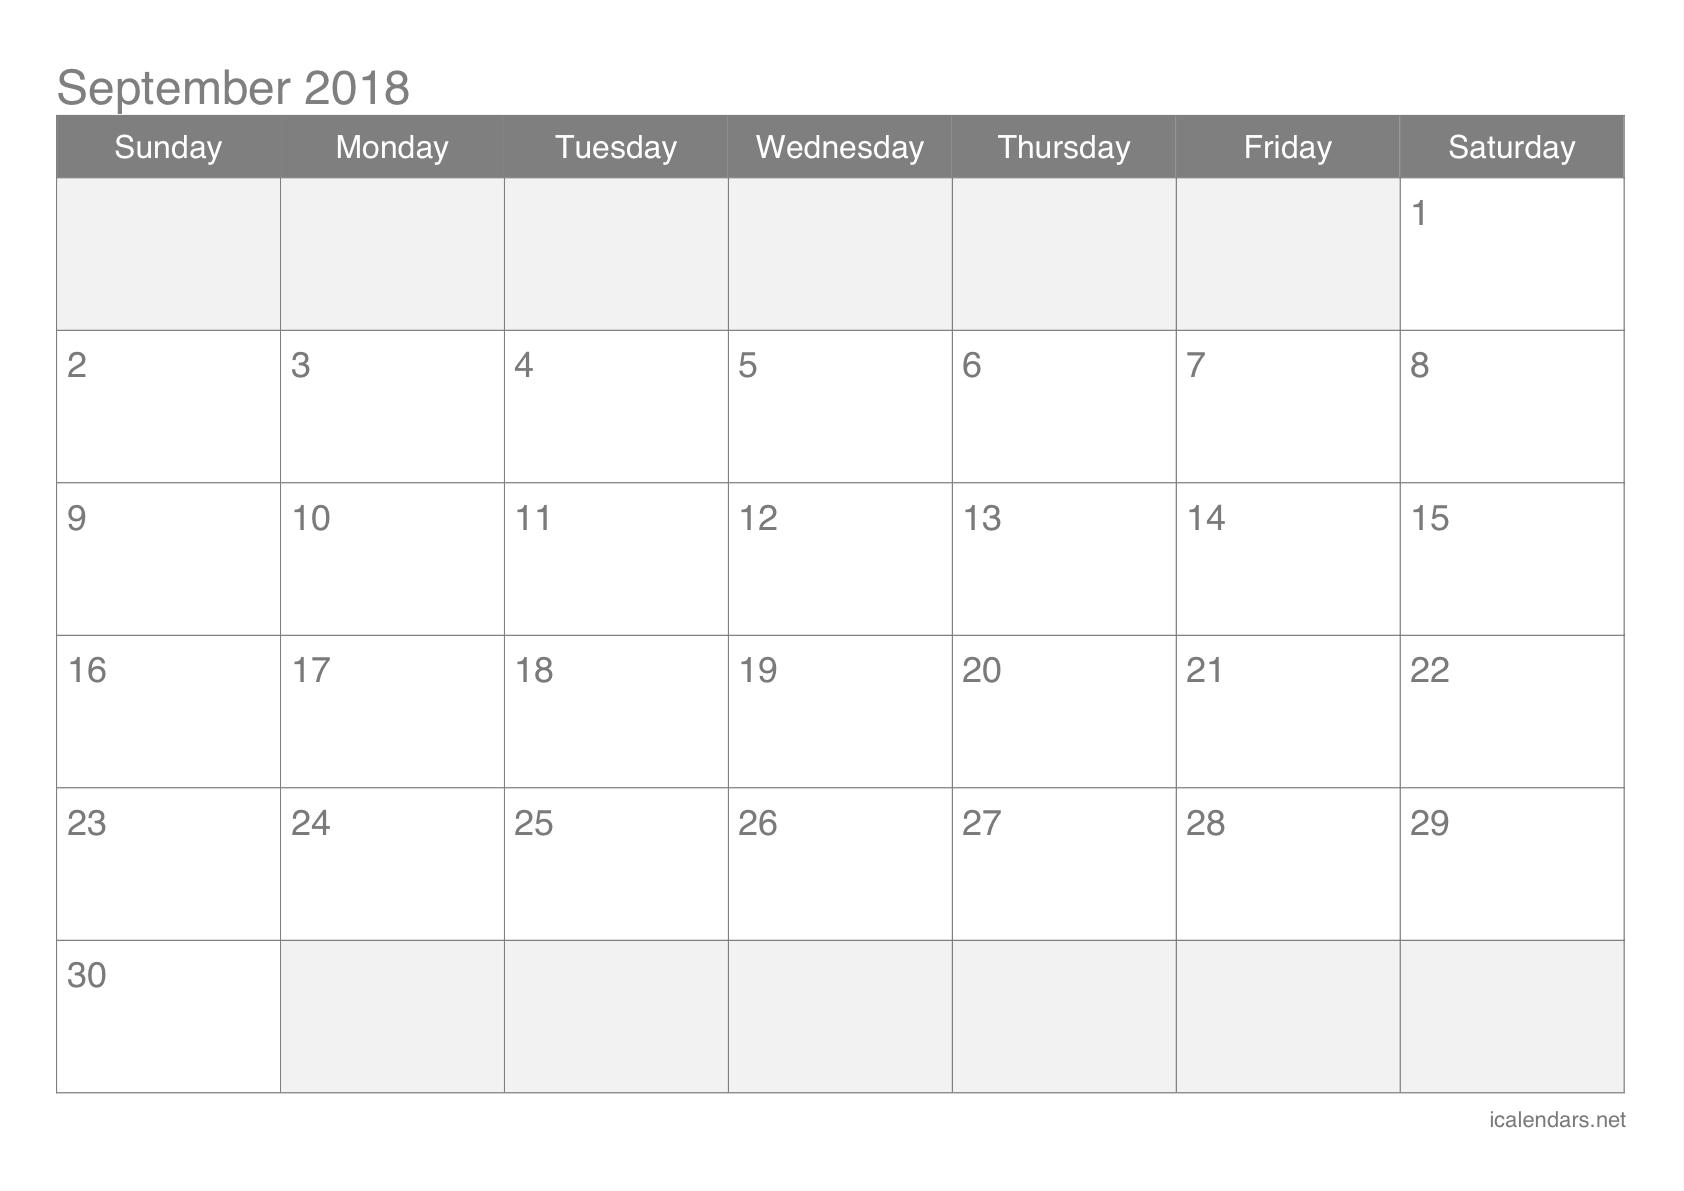 September 2018 Printable Calendar - Icalendars inside Print Out Of September Calendar